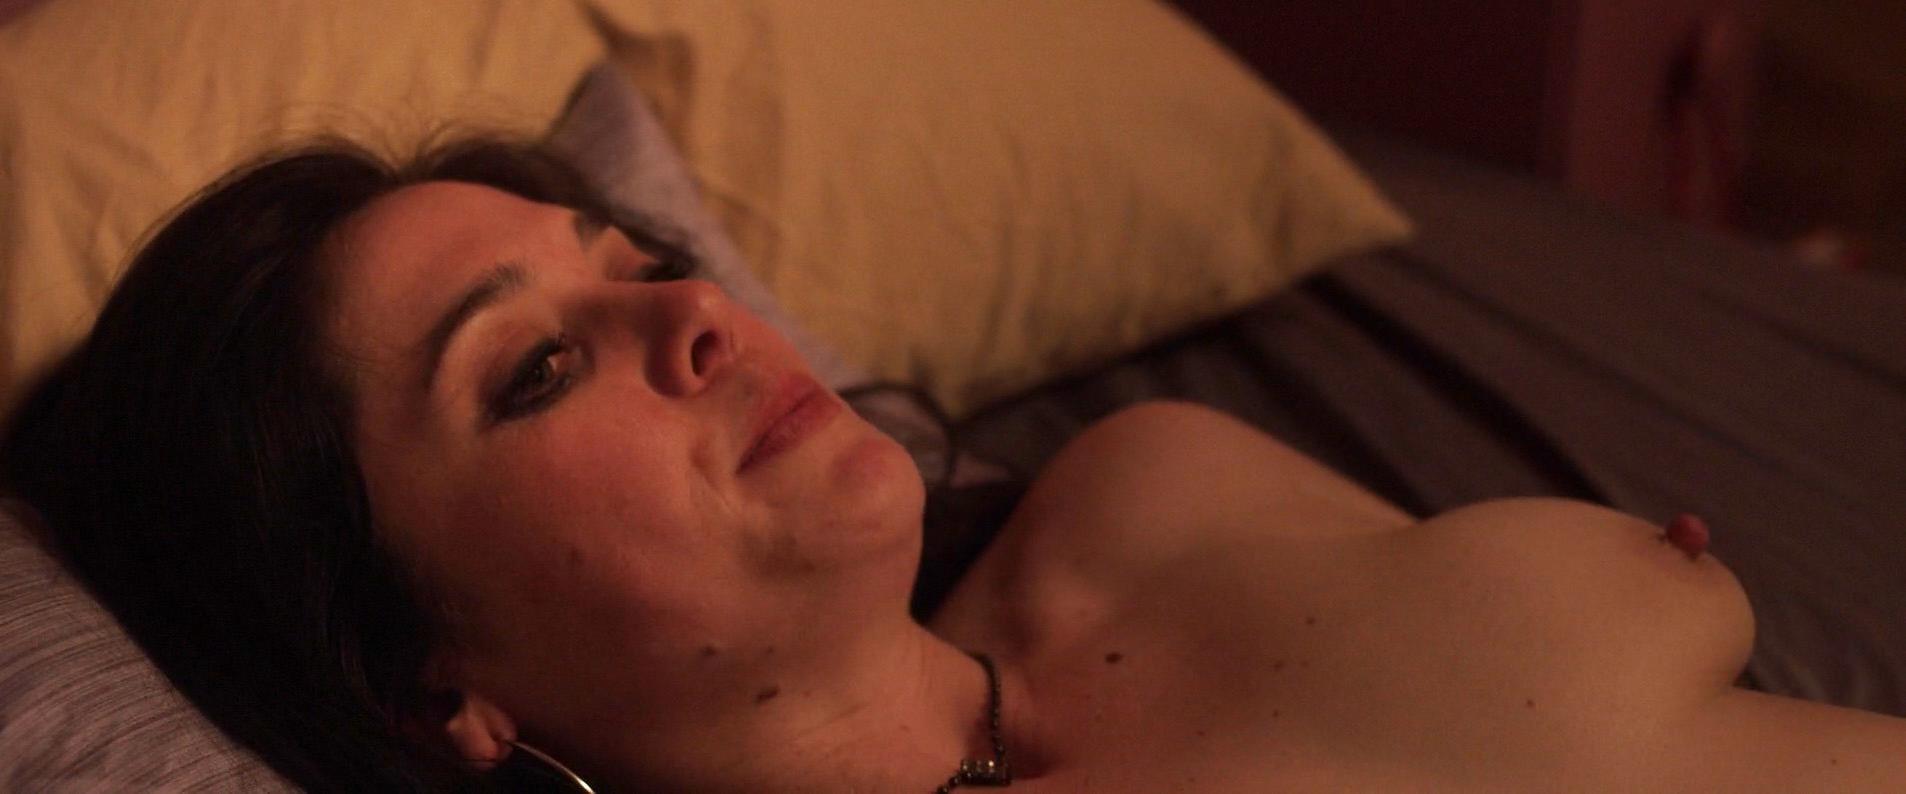 Mariel Neto nude - 7 Minutes (2014)